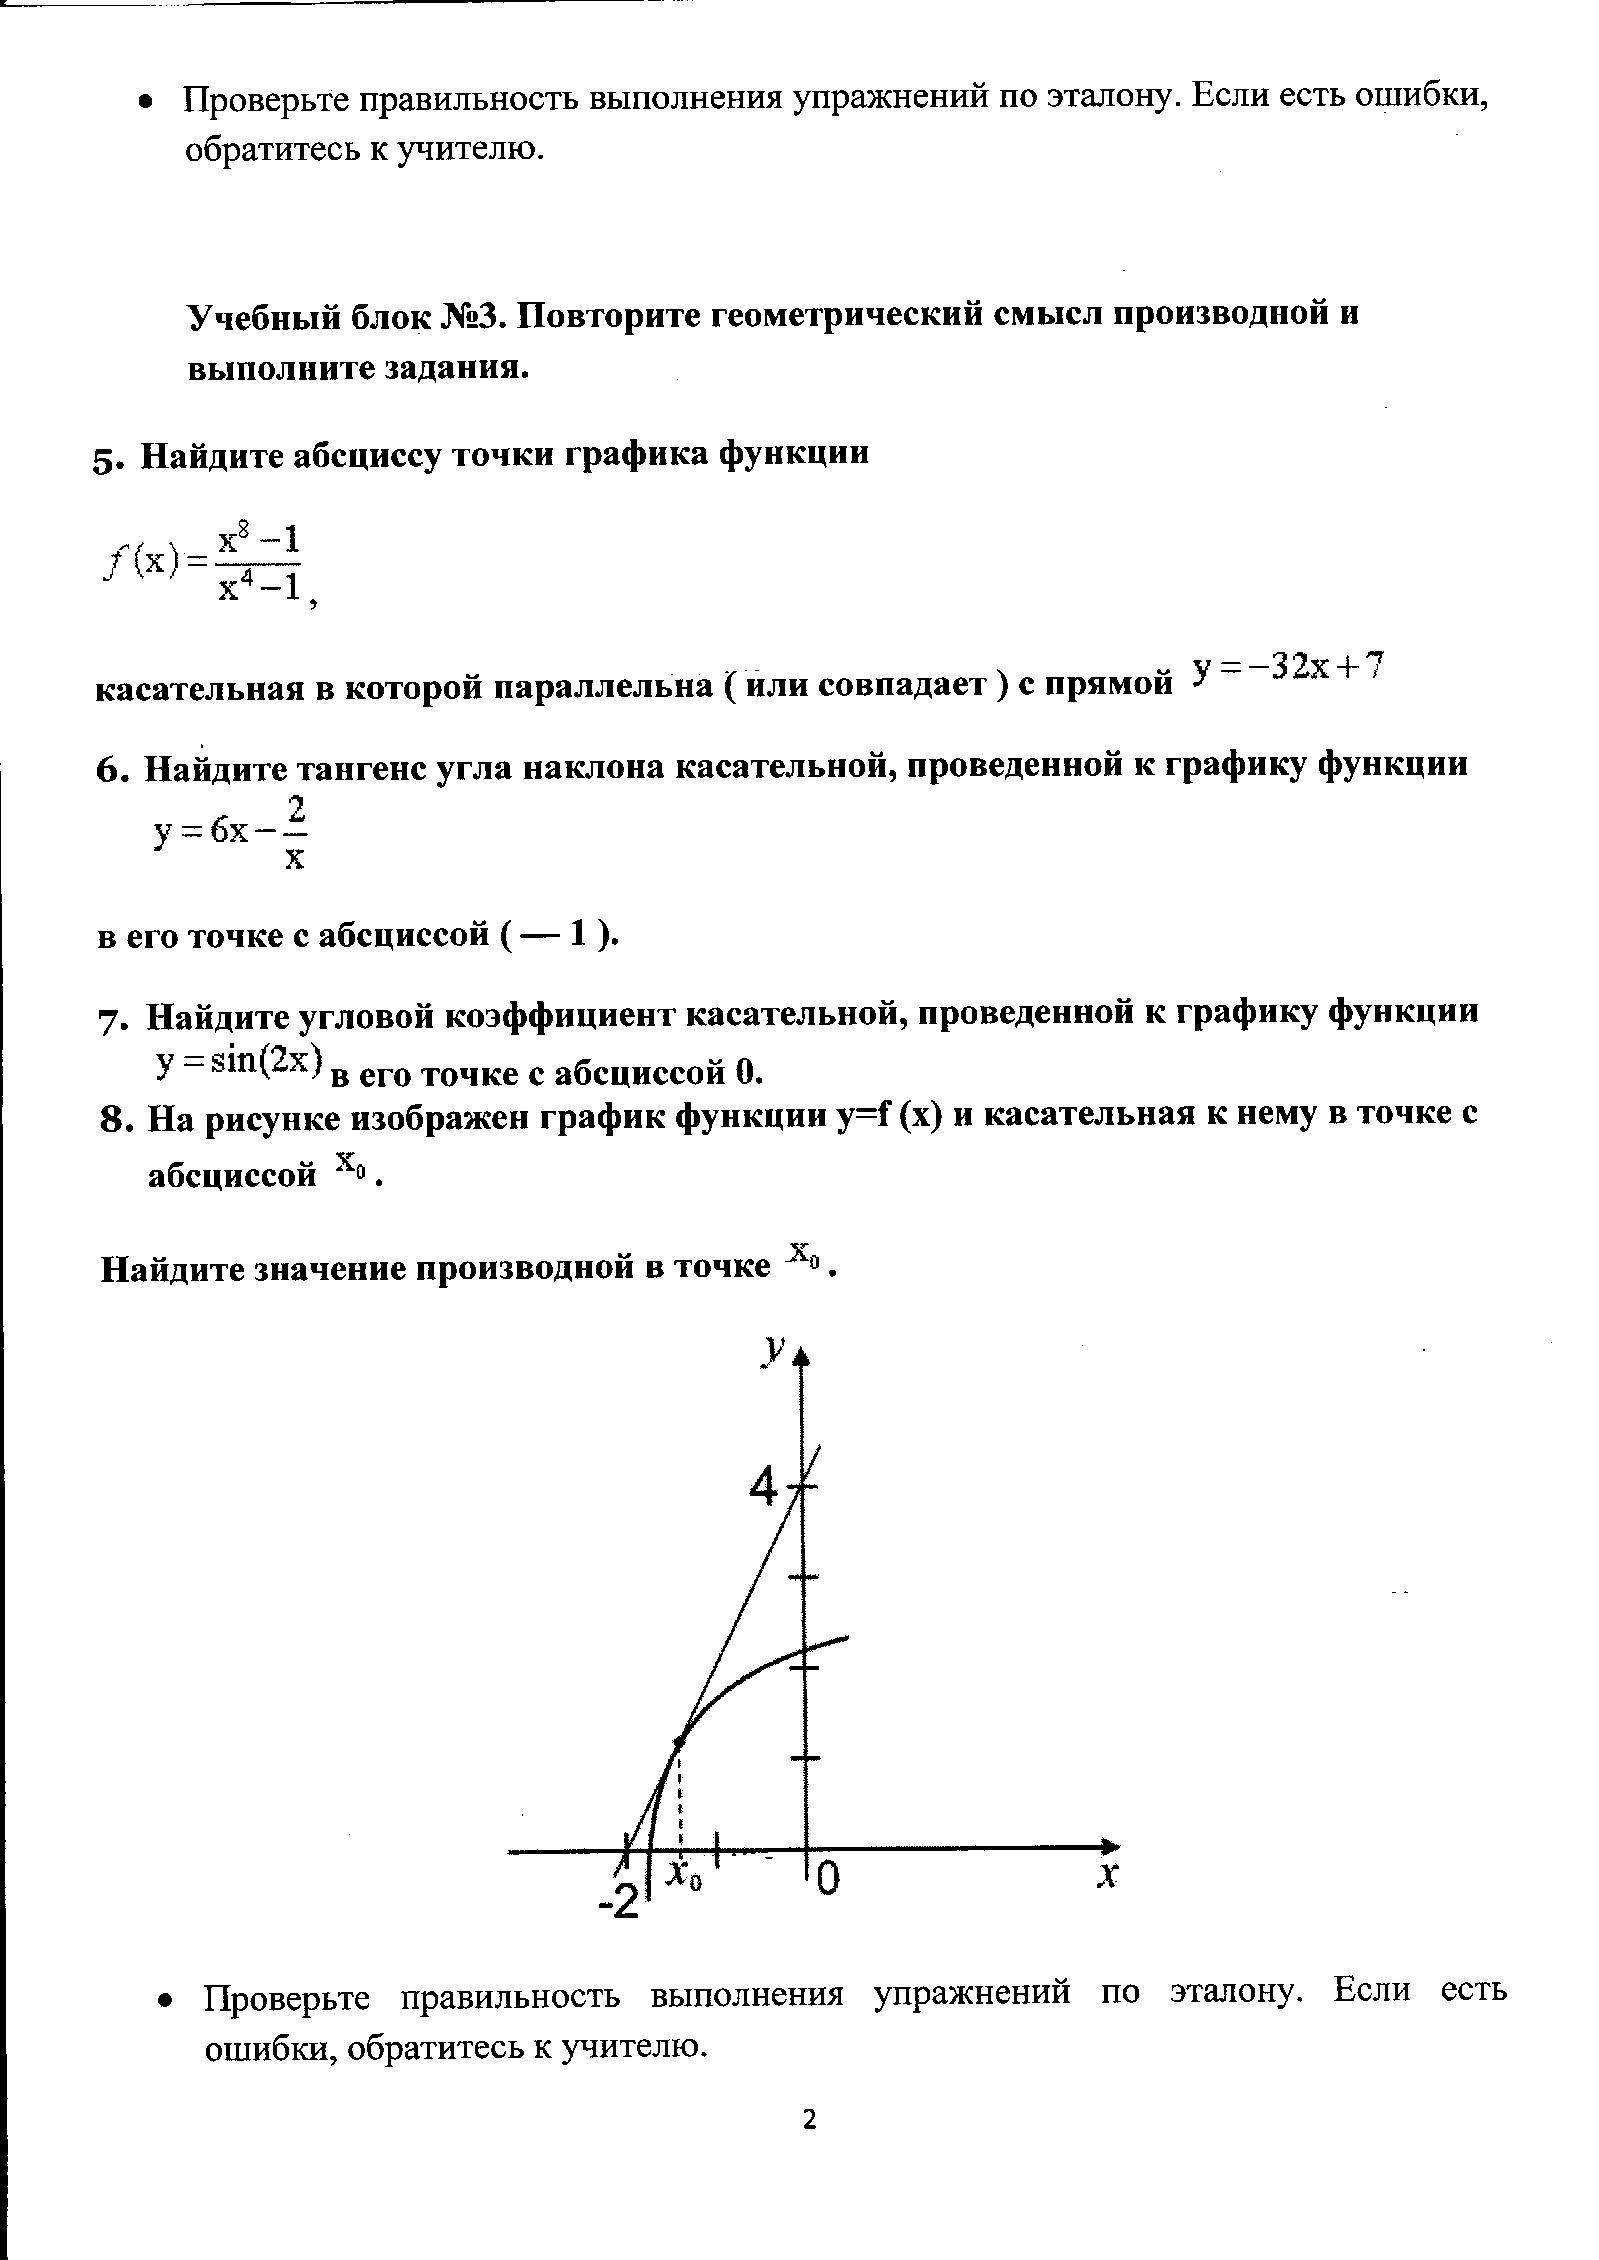 C:\Documents and Settings\Юлия\Мои документы\Мои рисунки\MP Navigator EX\2012_02_20\IMG_0002.tif